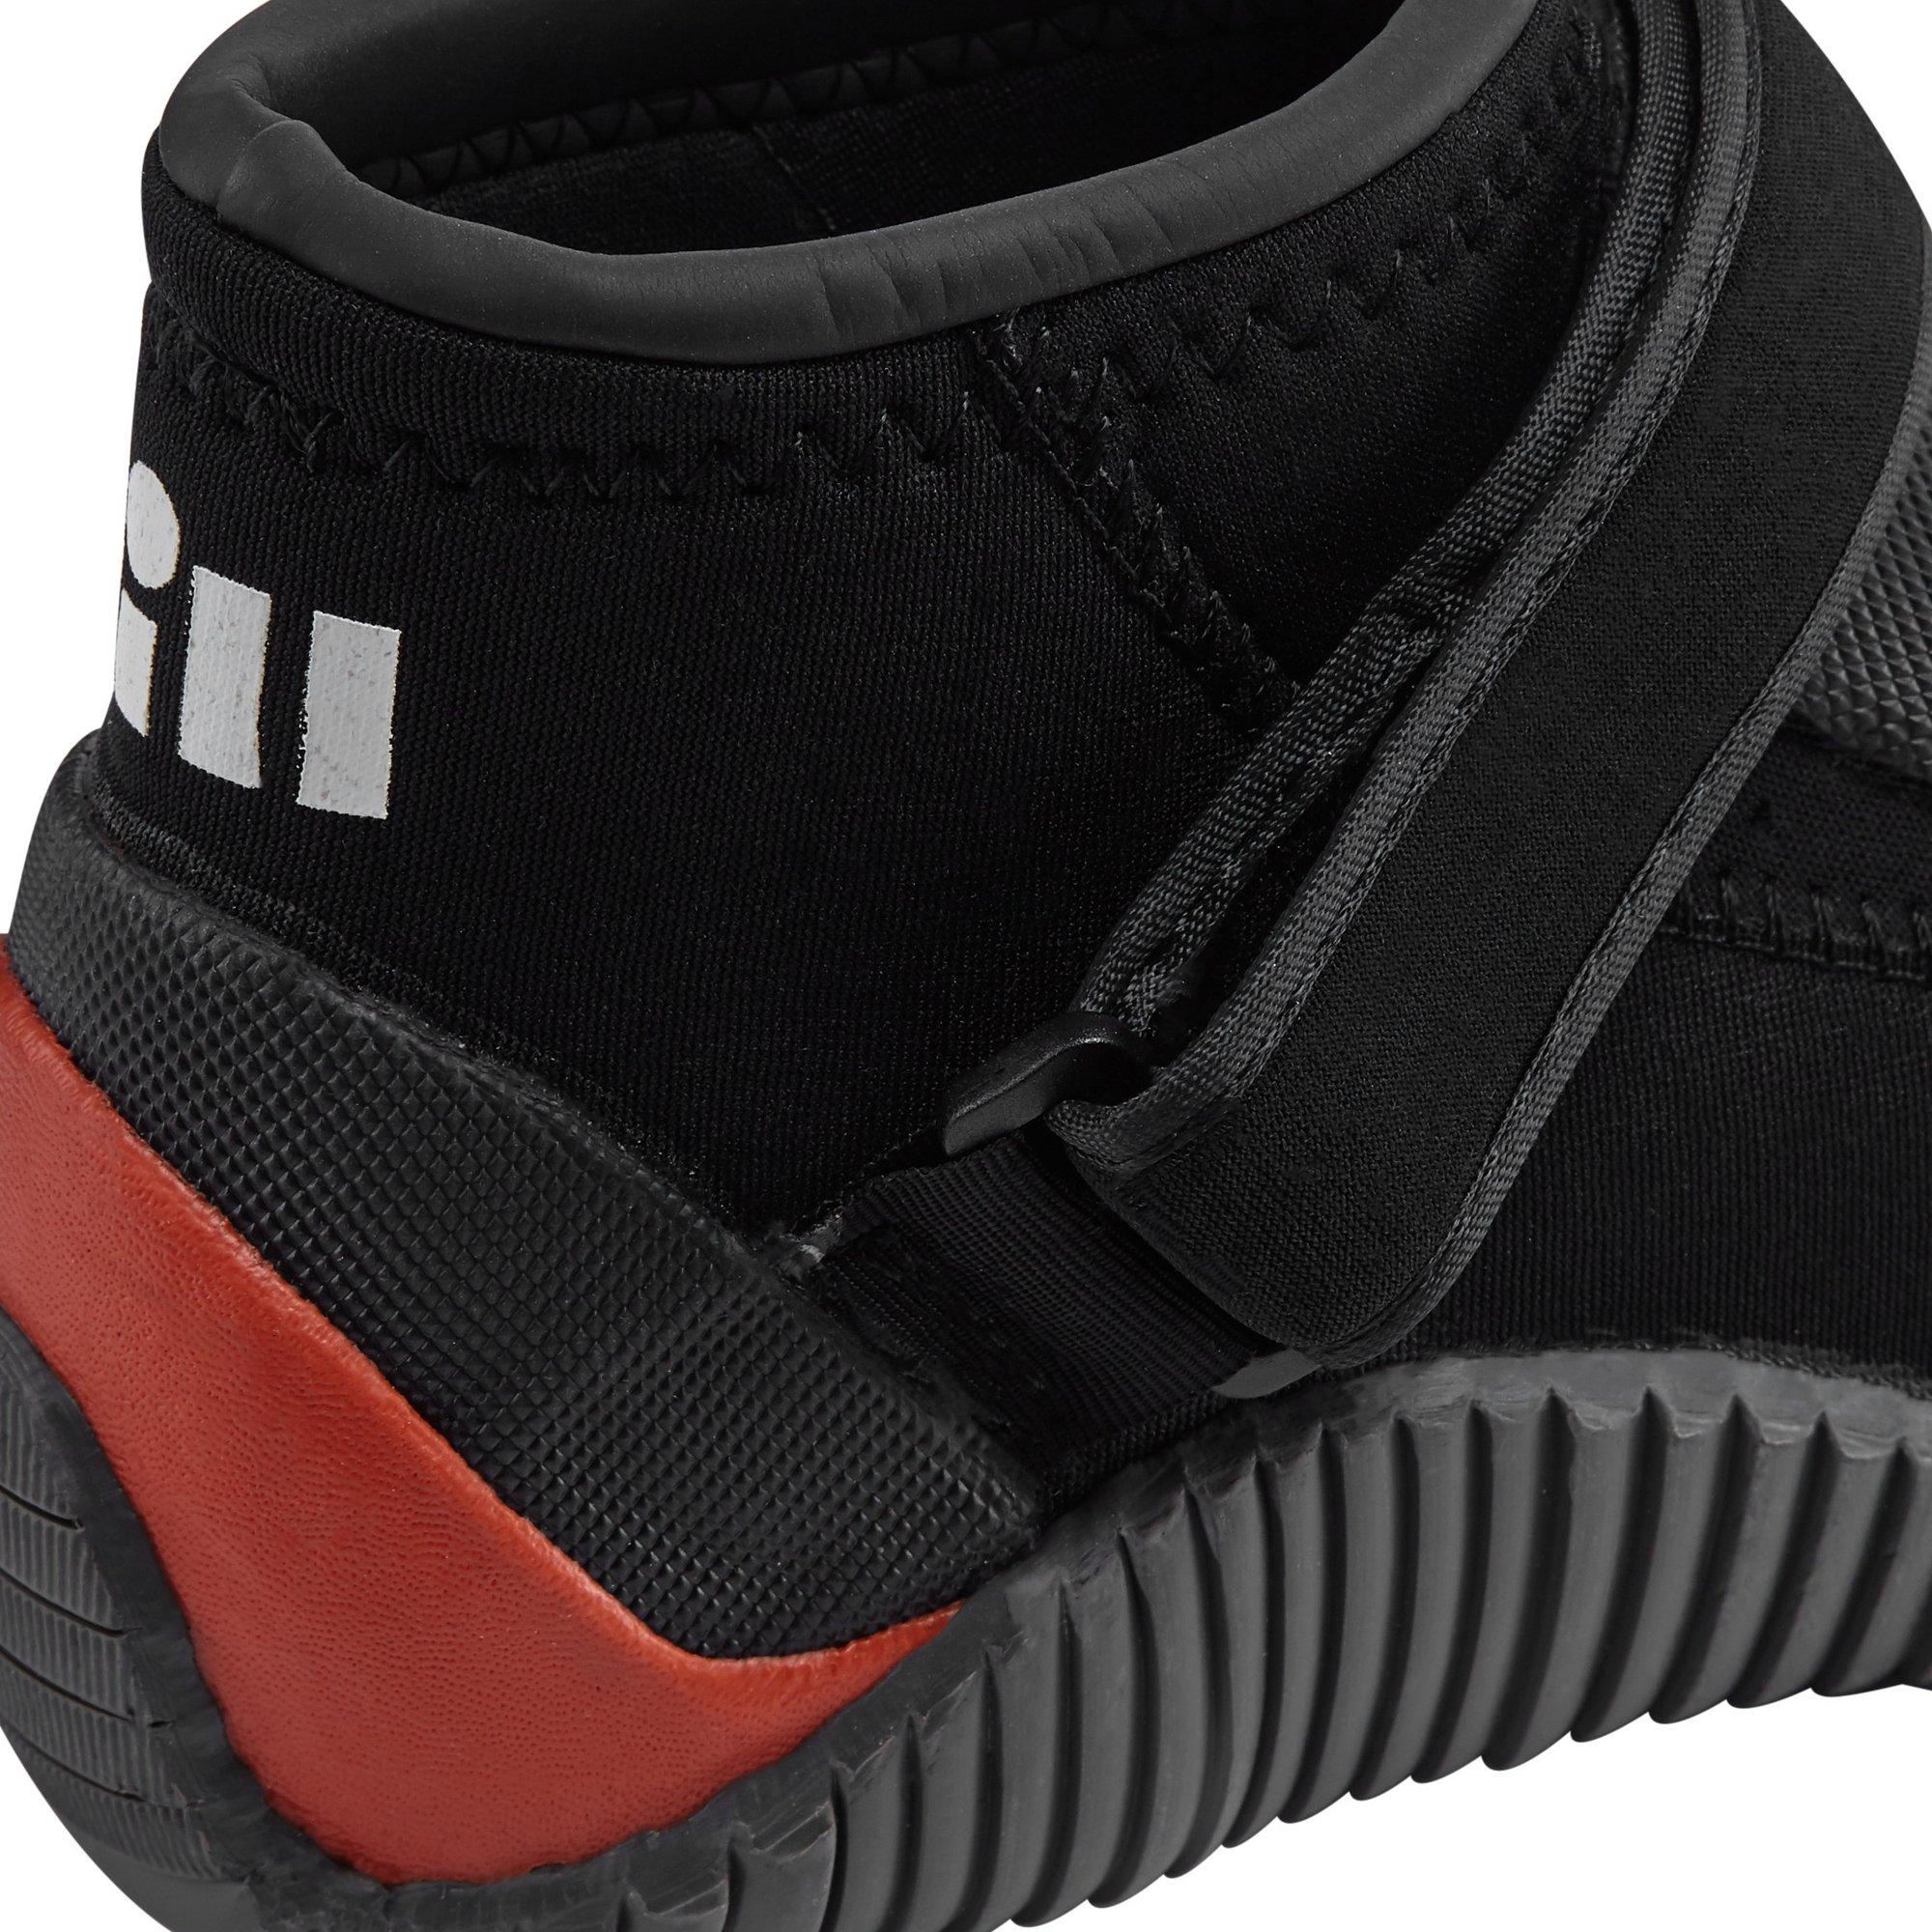 Aquatech Shoe - 963-BLK20-4.jpg